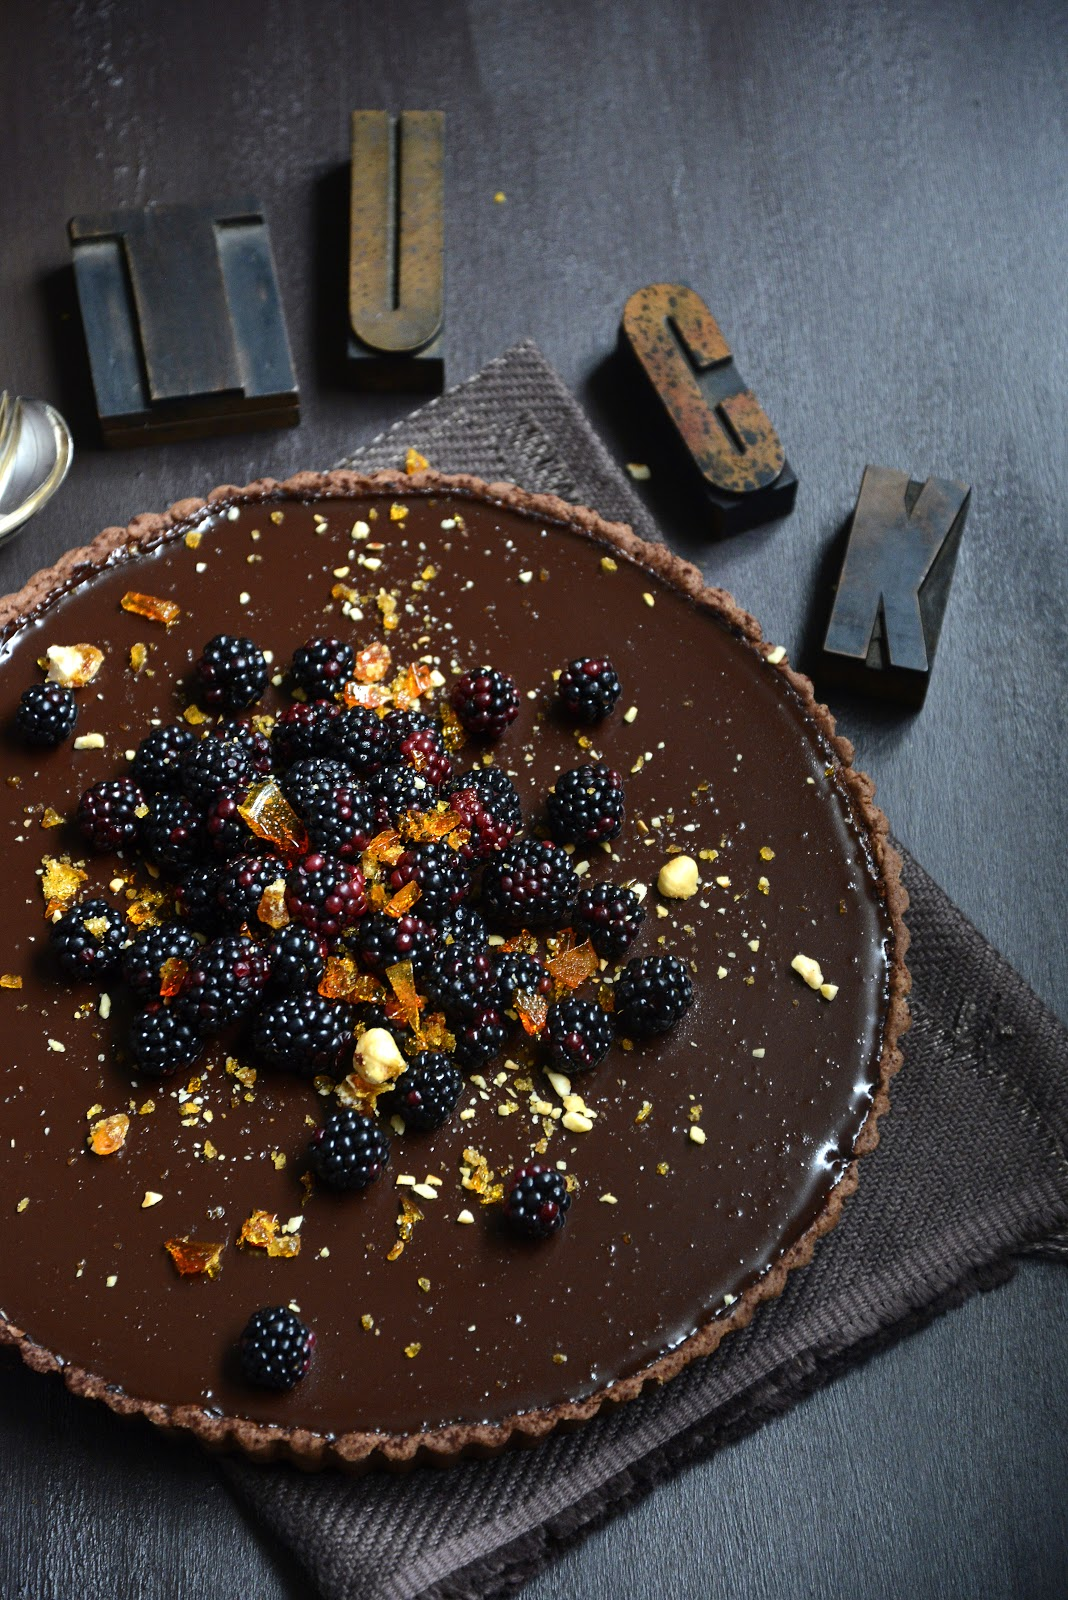 Dark Chocolate Tart with Blackberries and Hazelnut Praline | From The Kitchen | Six Sinful Chocolate Desserts